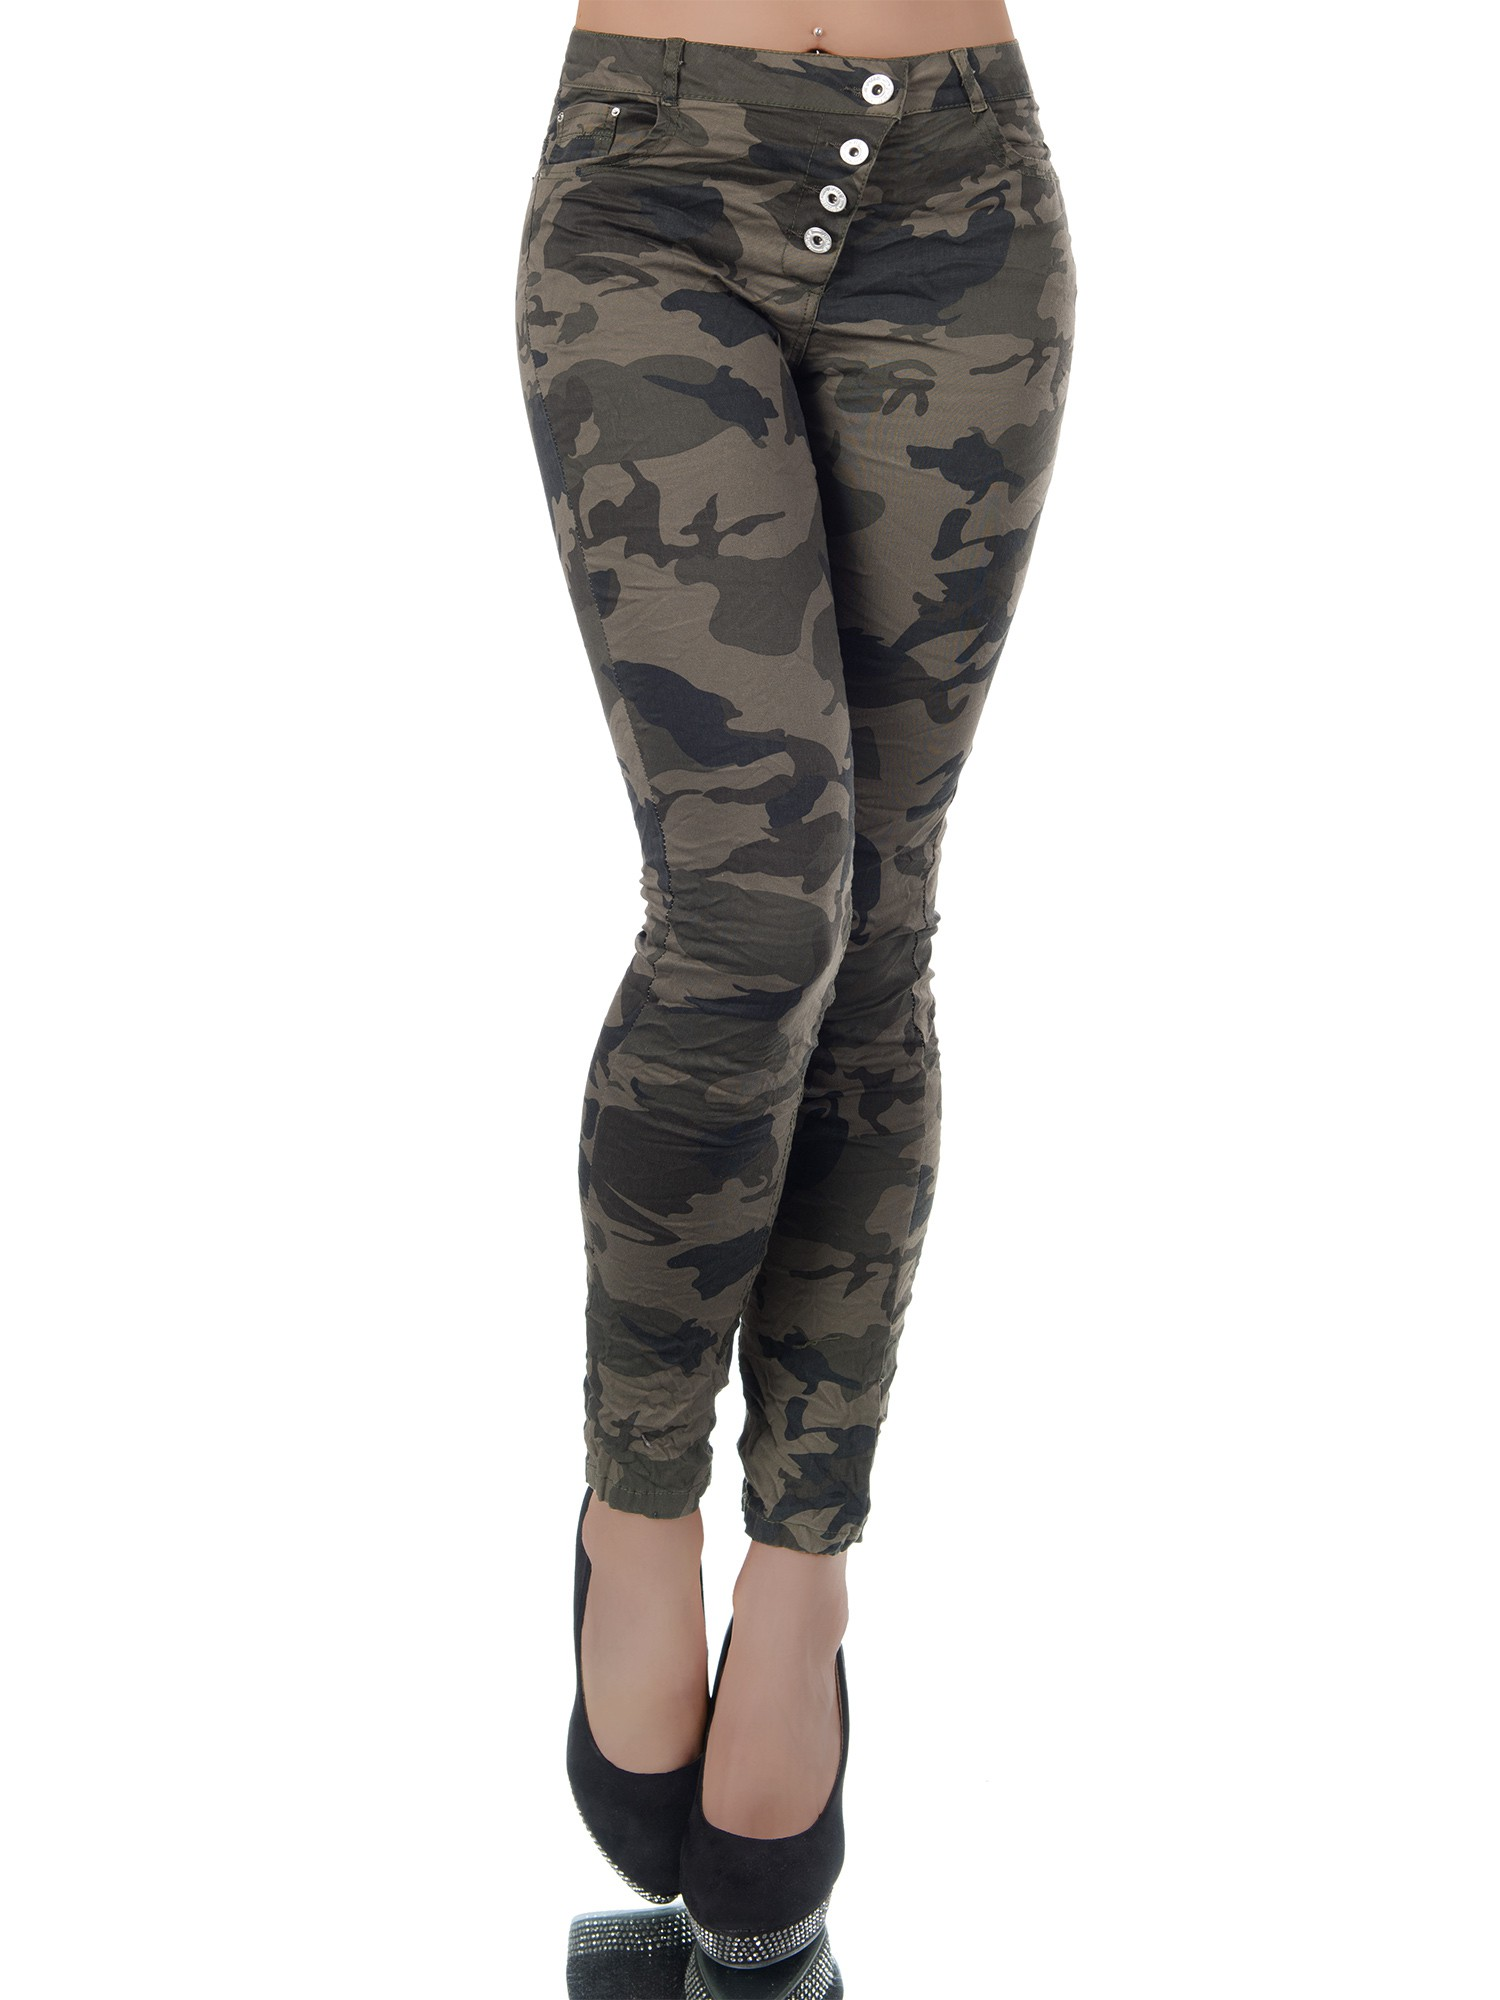 Dámské strečové džíny ARMY khaki (Dámské džíny)